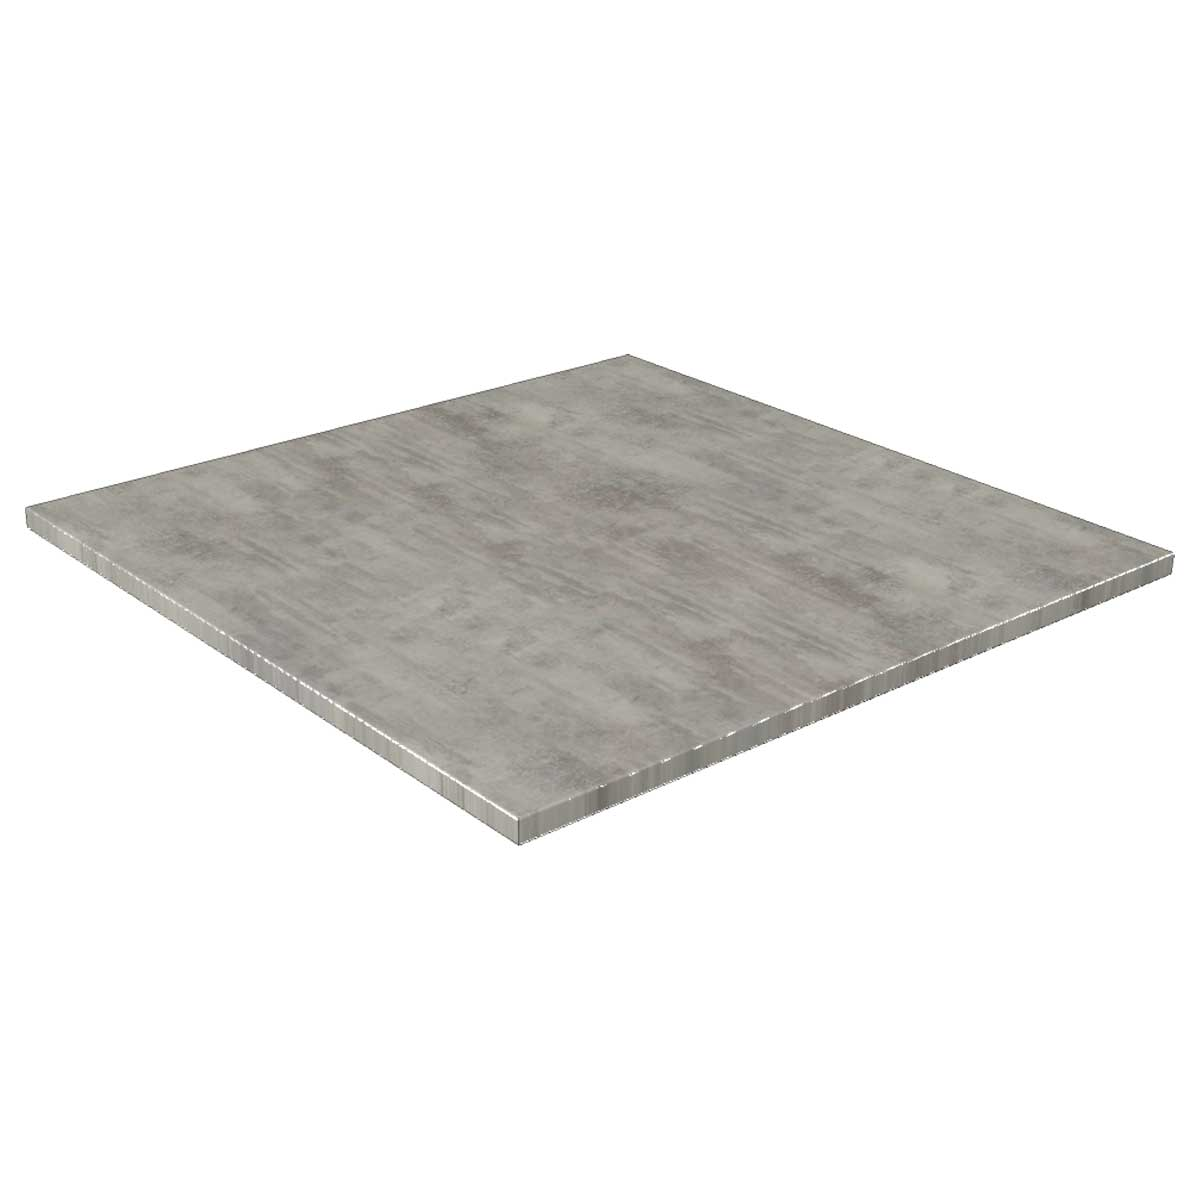 TICAM Q70 3331 - https://www.werzalit.com/en/product/table-top-cambium-q-70x70cm-board-thickness-39cm-decor-dortmund/